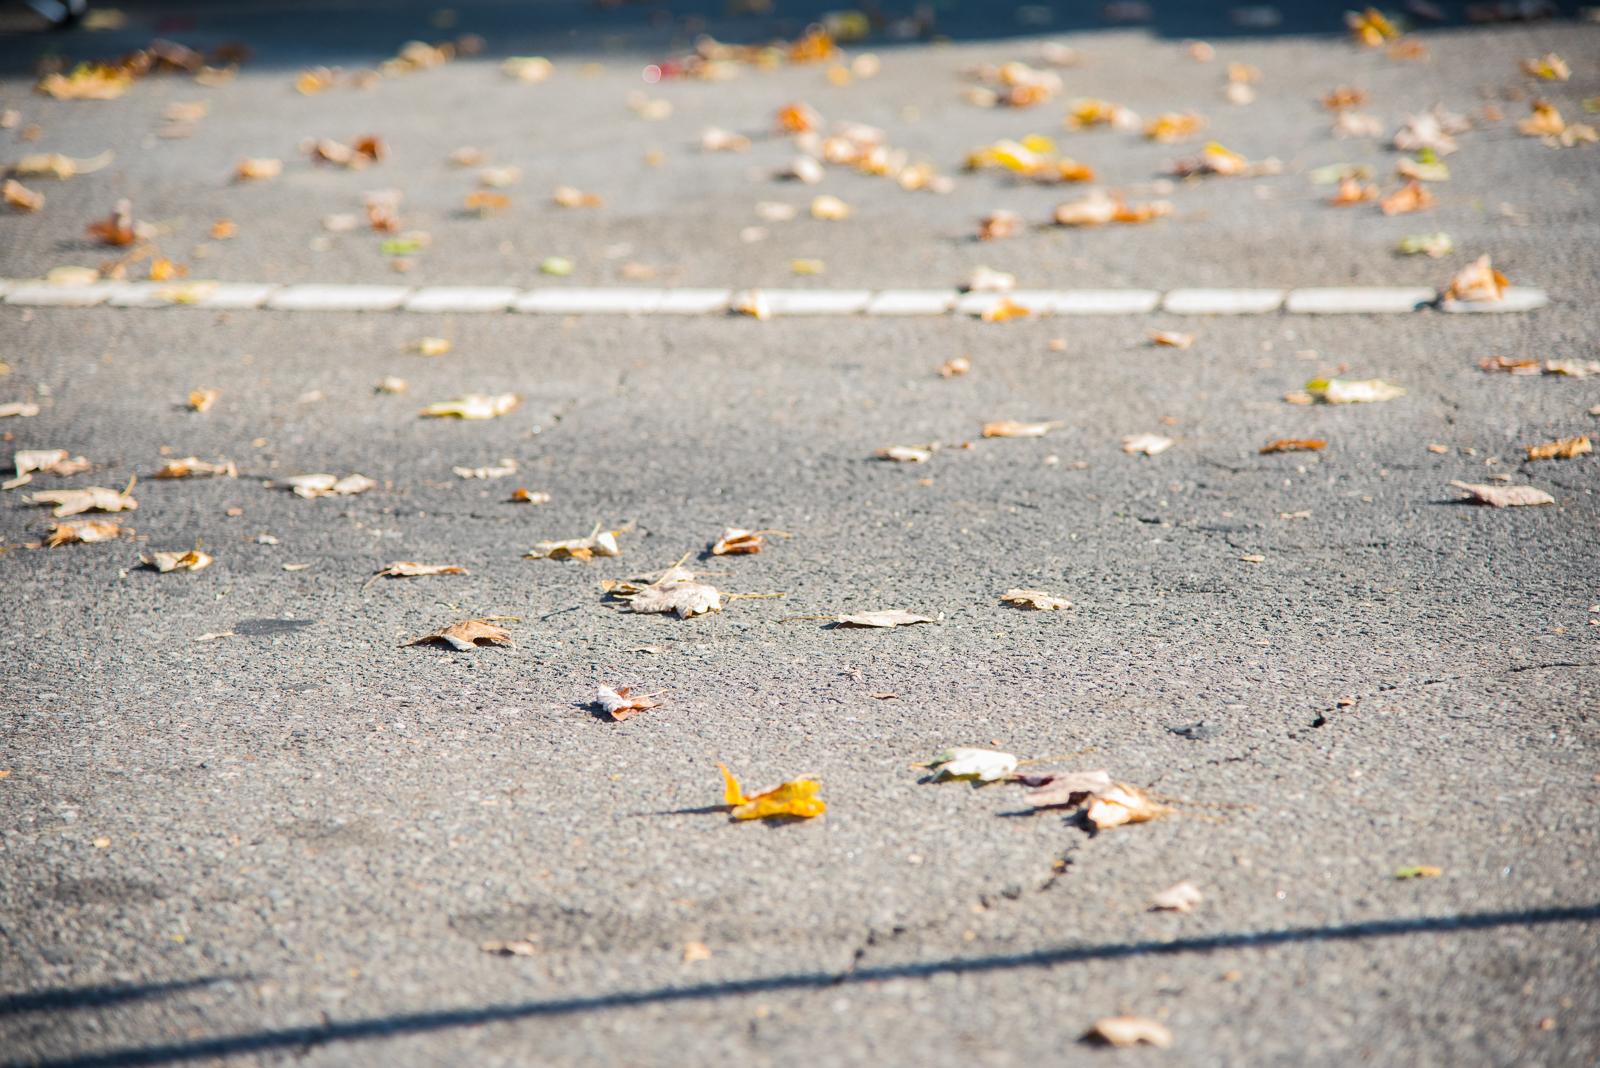 Boudoir-Photographer-Mt-Airy-NC-Seasons-Change.jpg